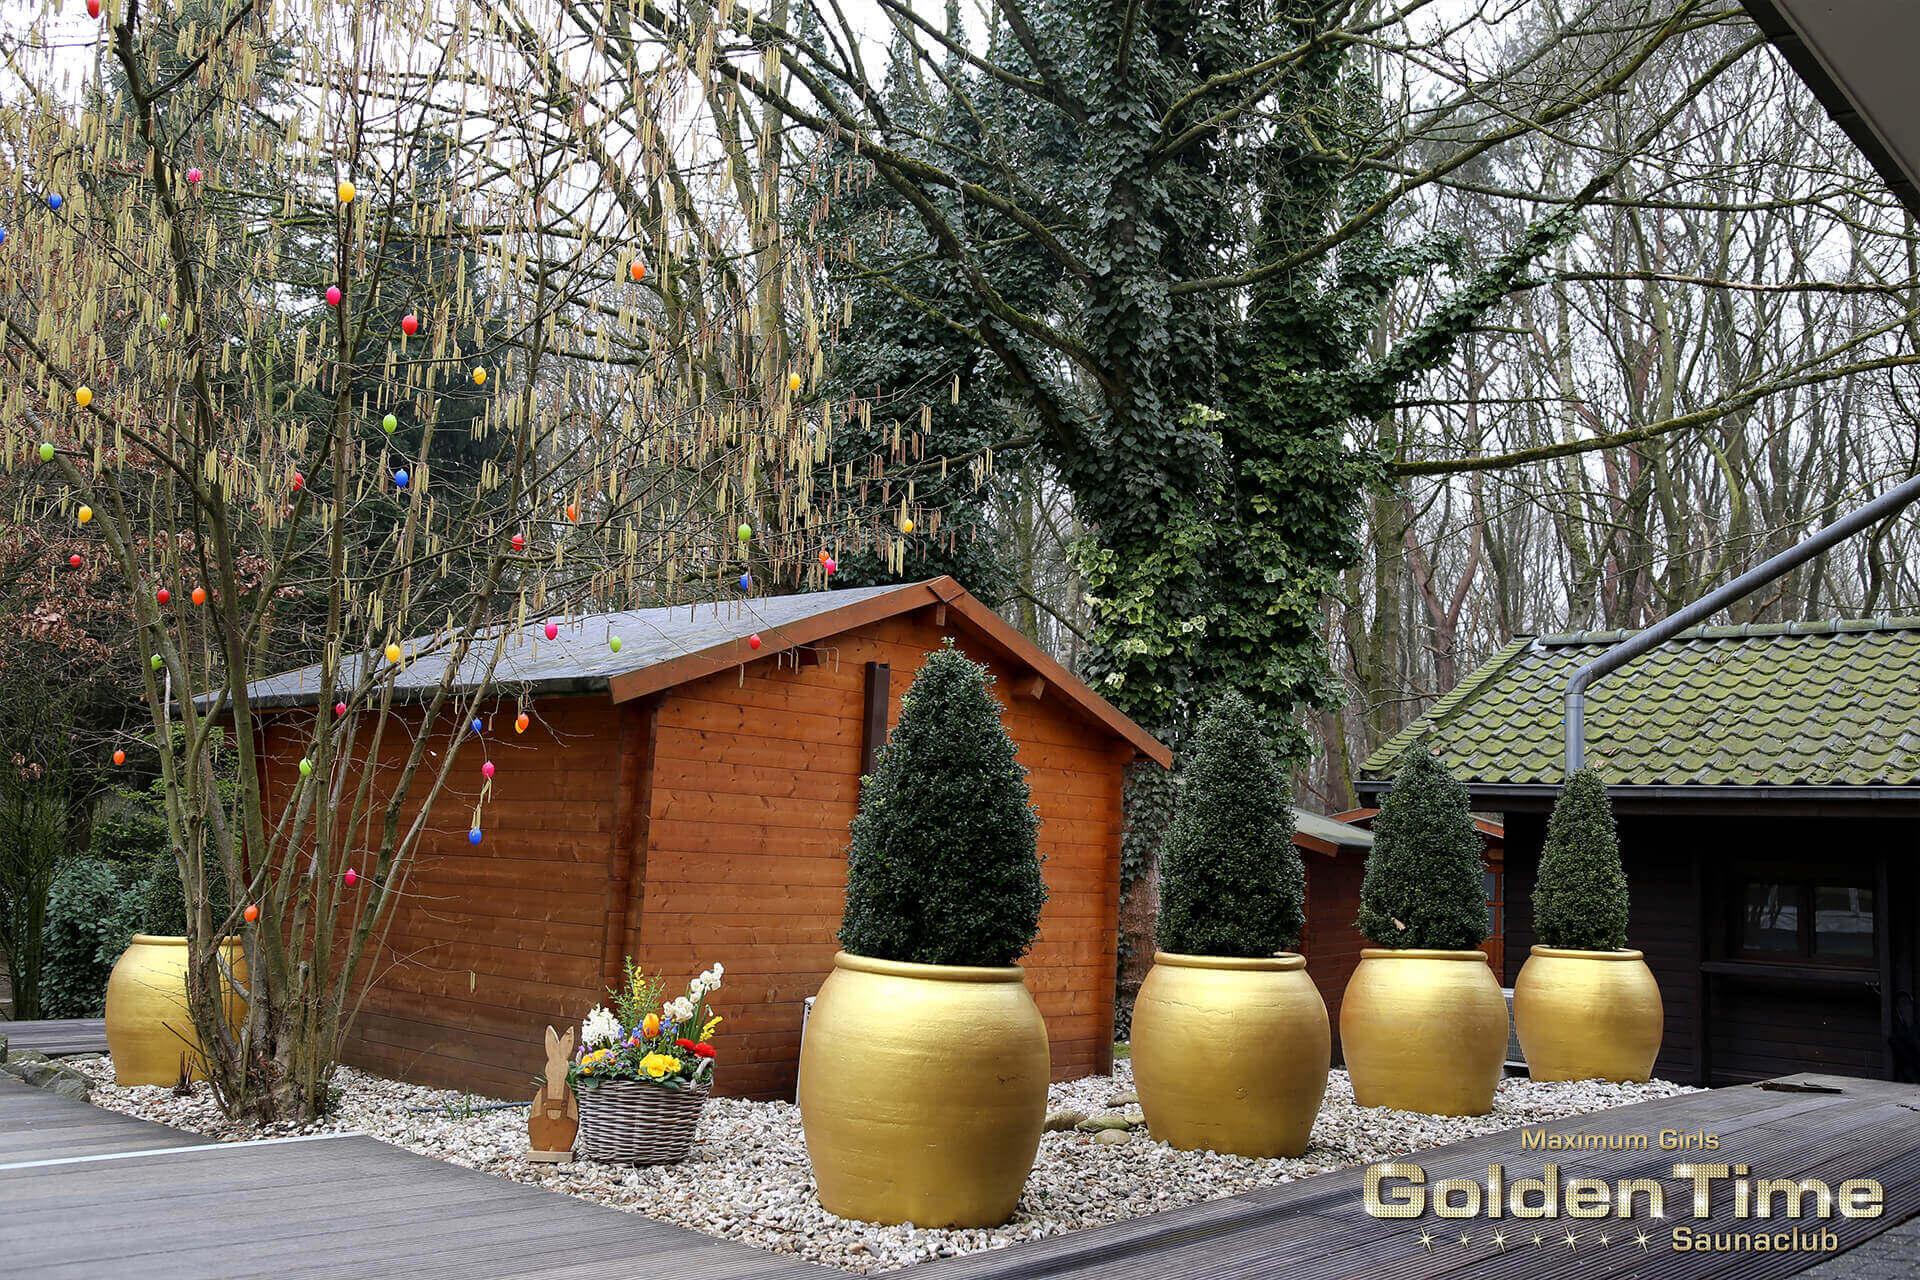 02-ostern-2016-pic-14-goldentime-saunaclub.jpg